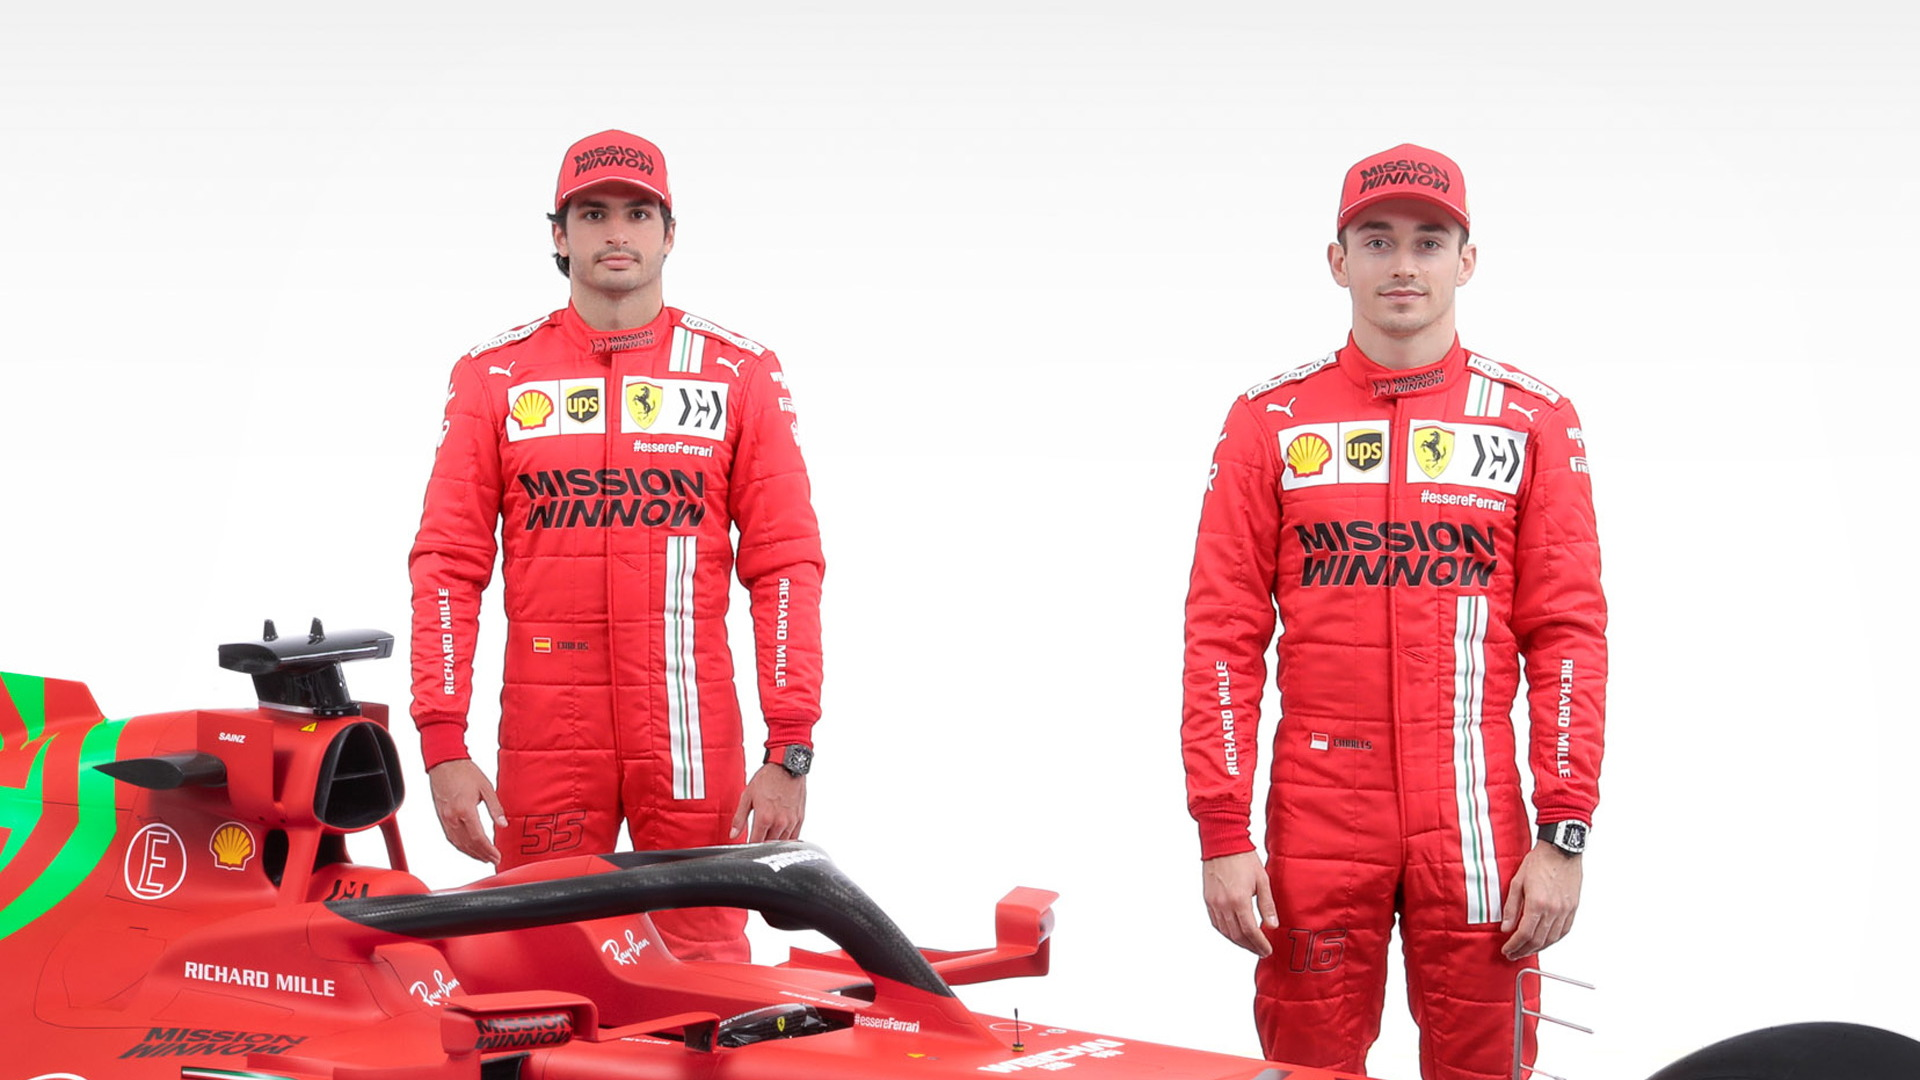 Carlos Sainz (left) and Charles Leclerc